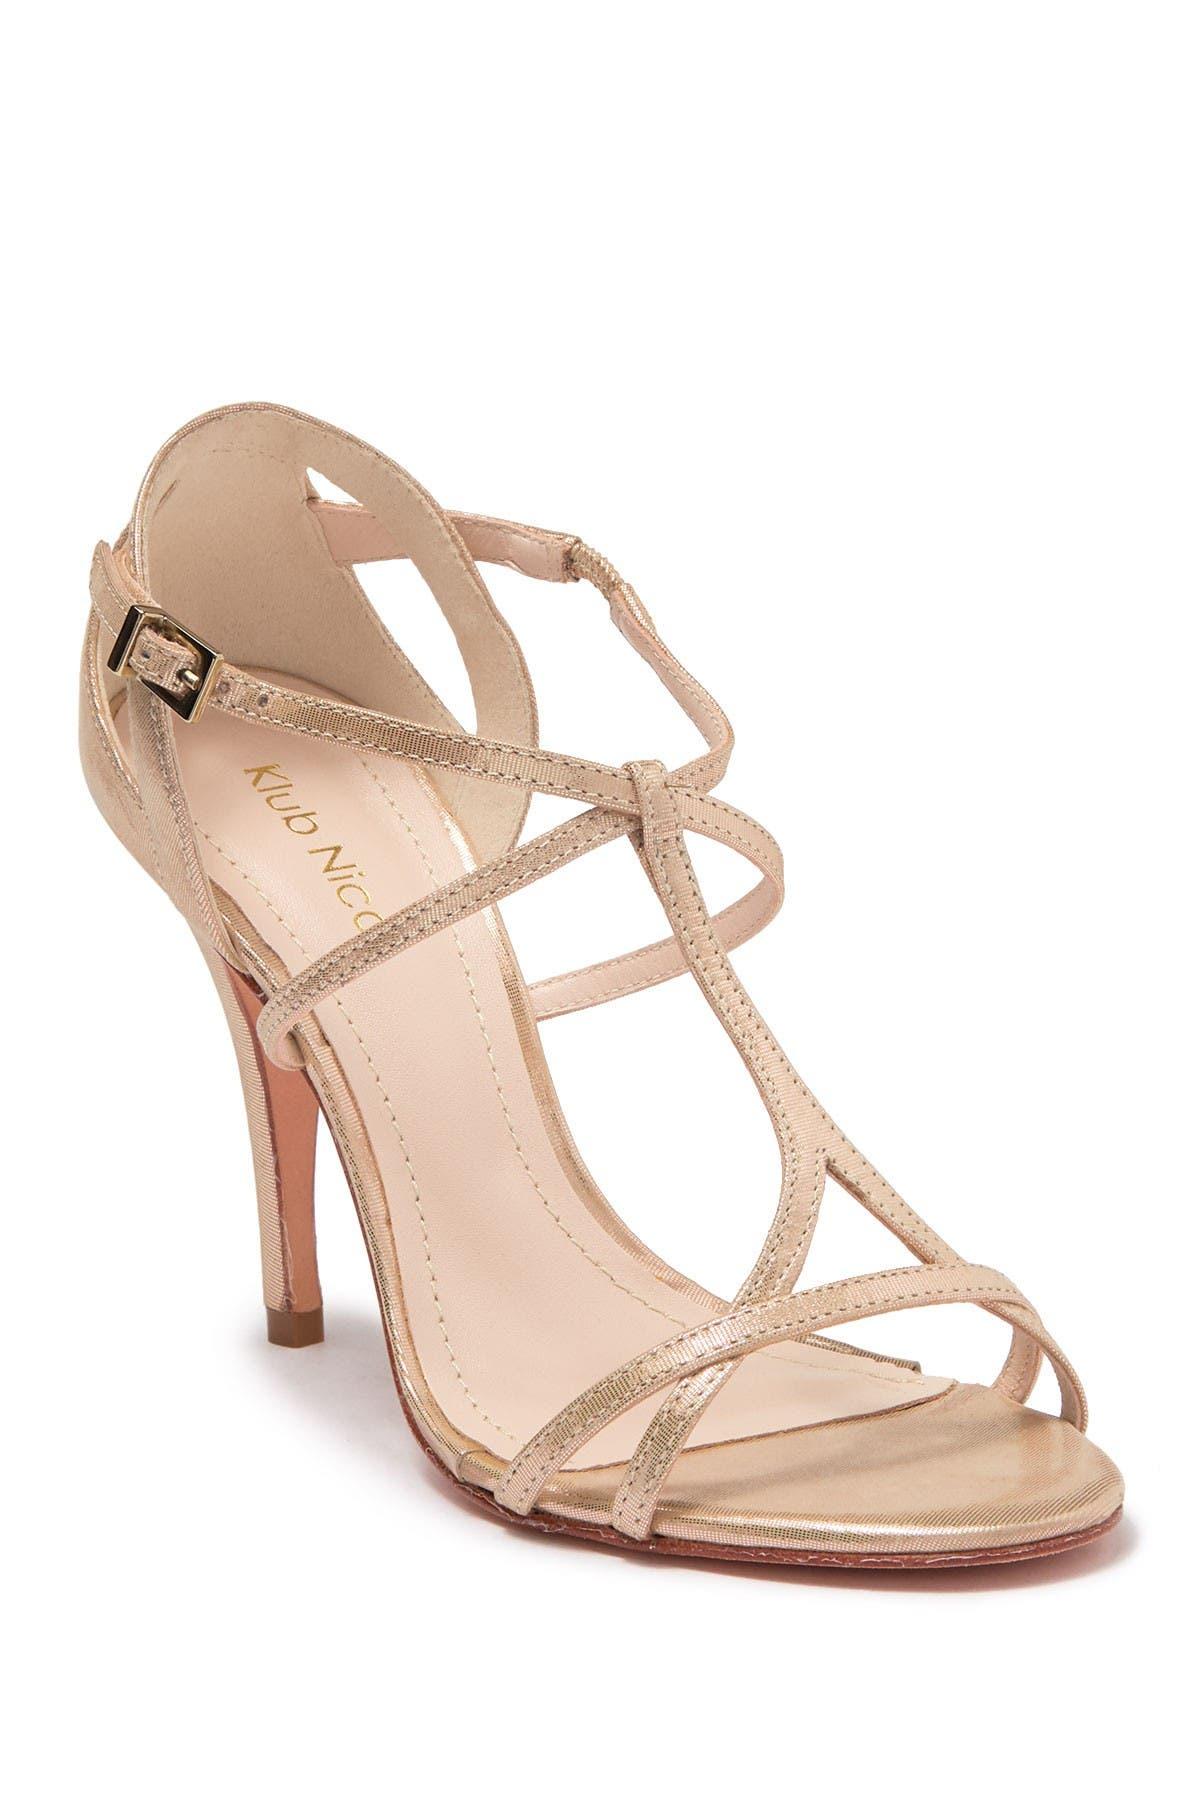 Image of Klub Nico Marlene Strappy Sandal